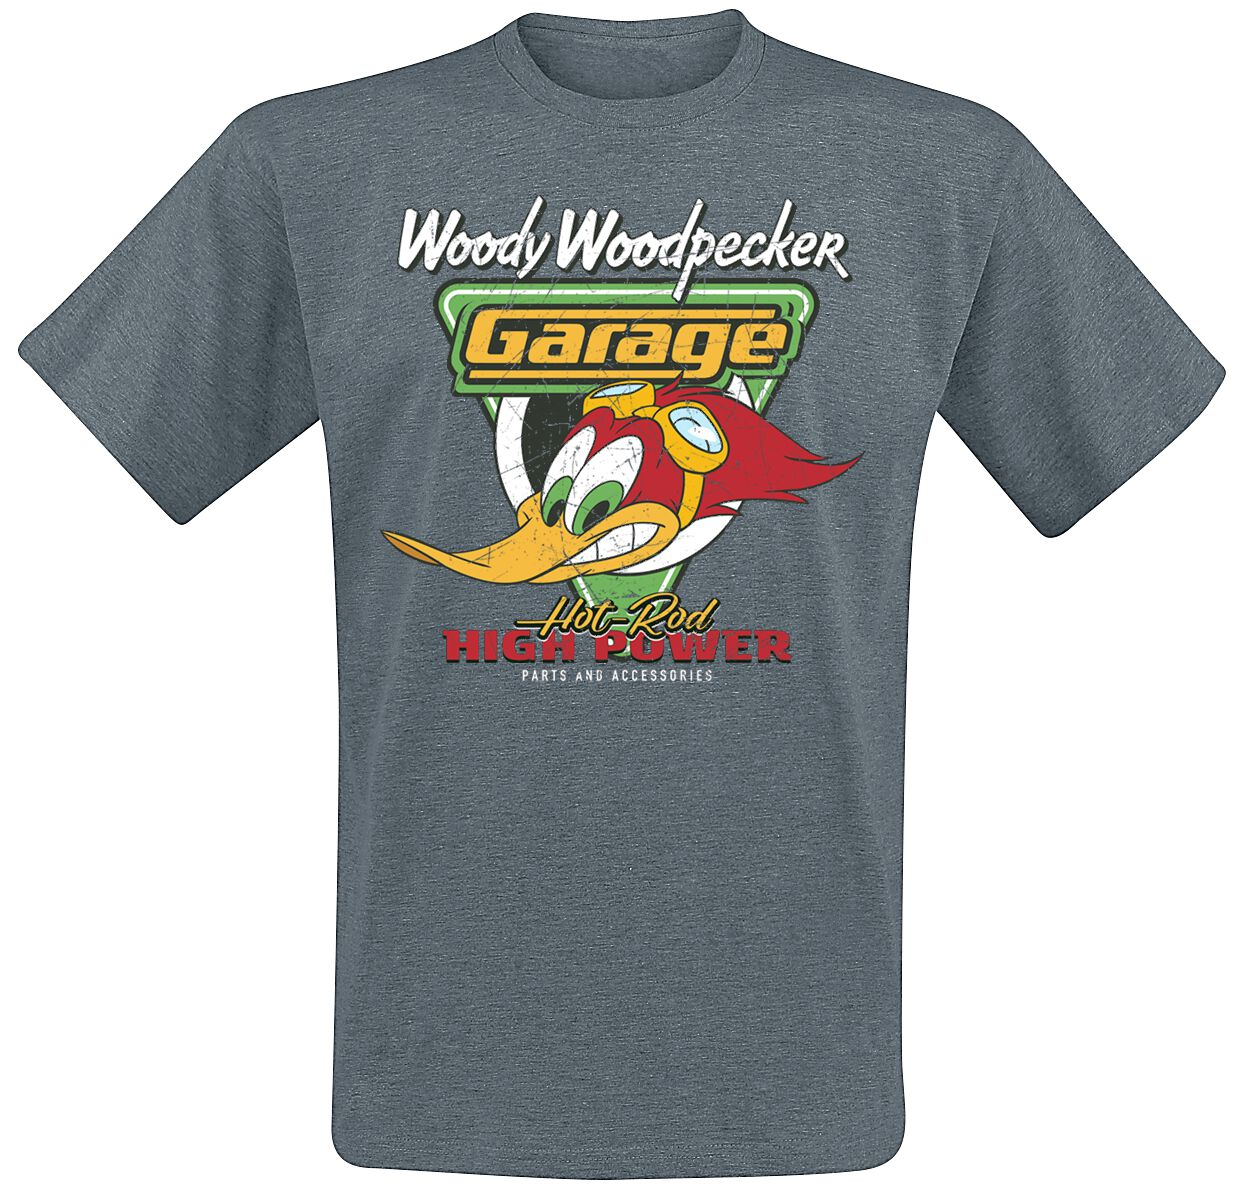 Woody Woodpecker Hot Rod Garage T-Shirt dunkelg...